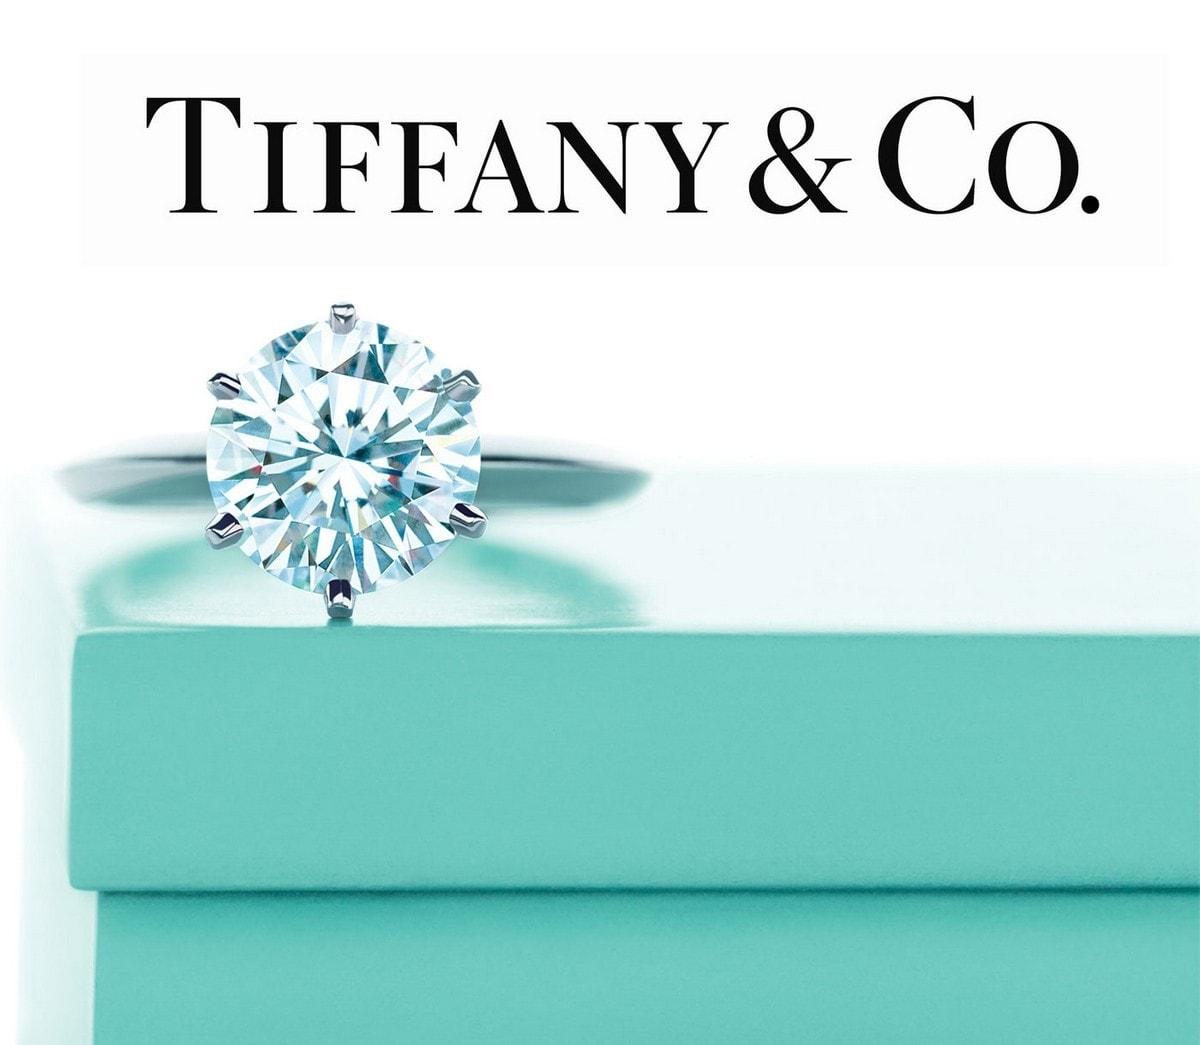 Marketing mix of Tiffany and Co - 3